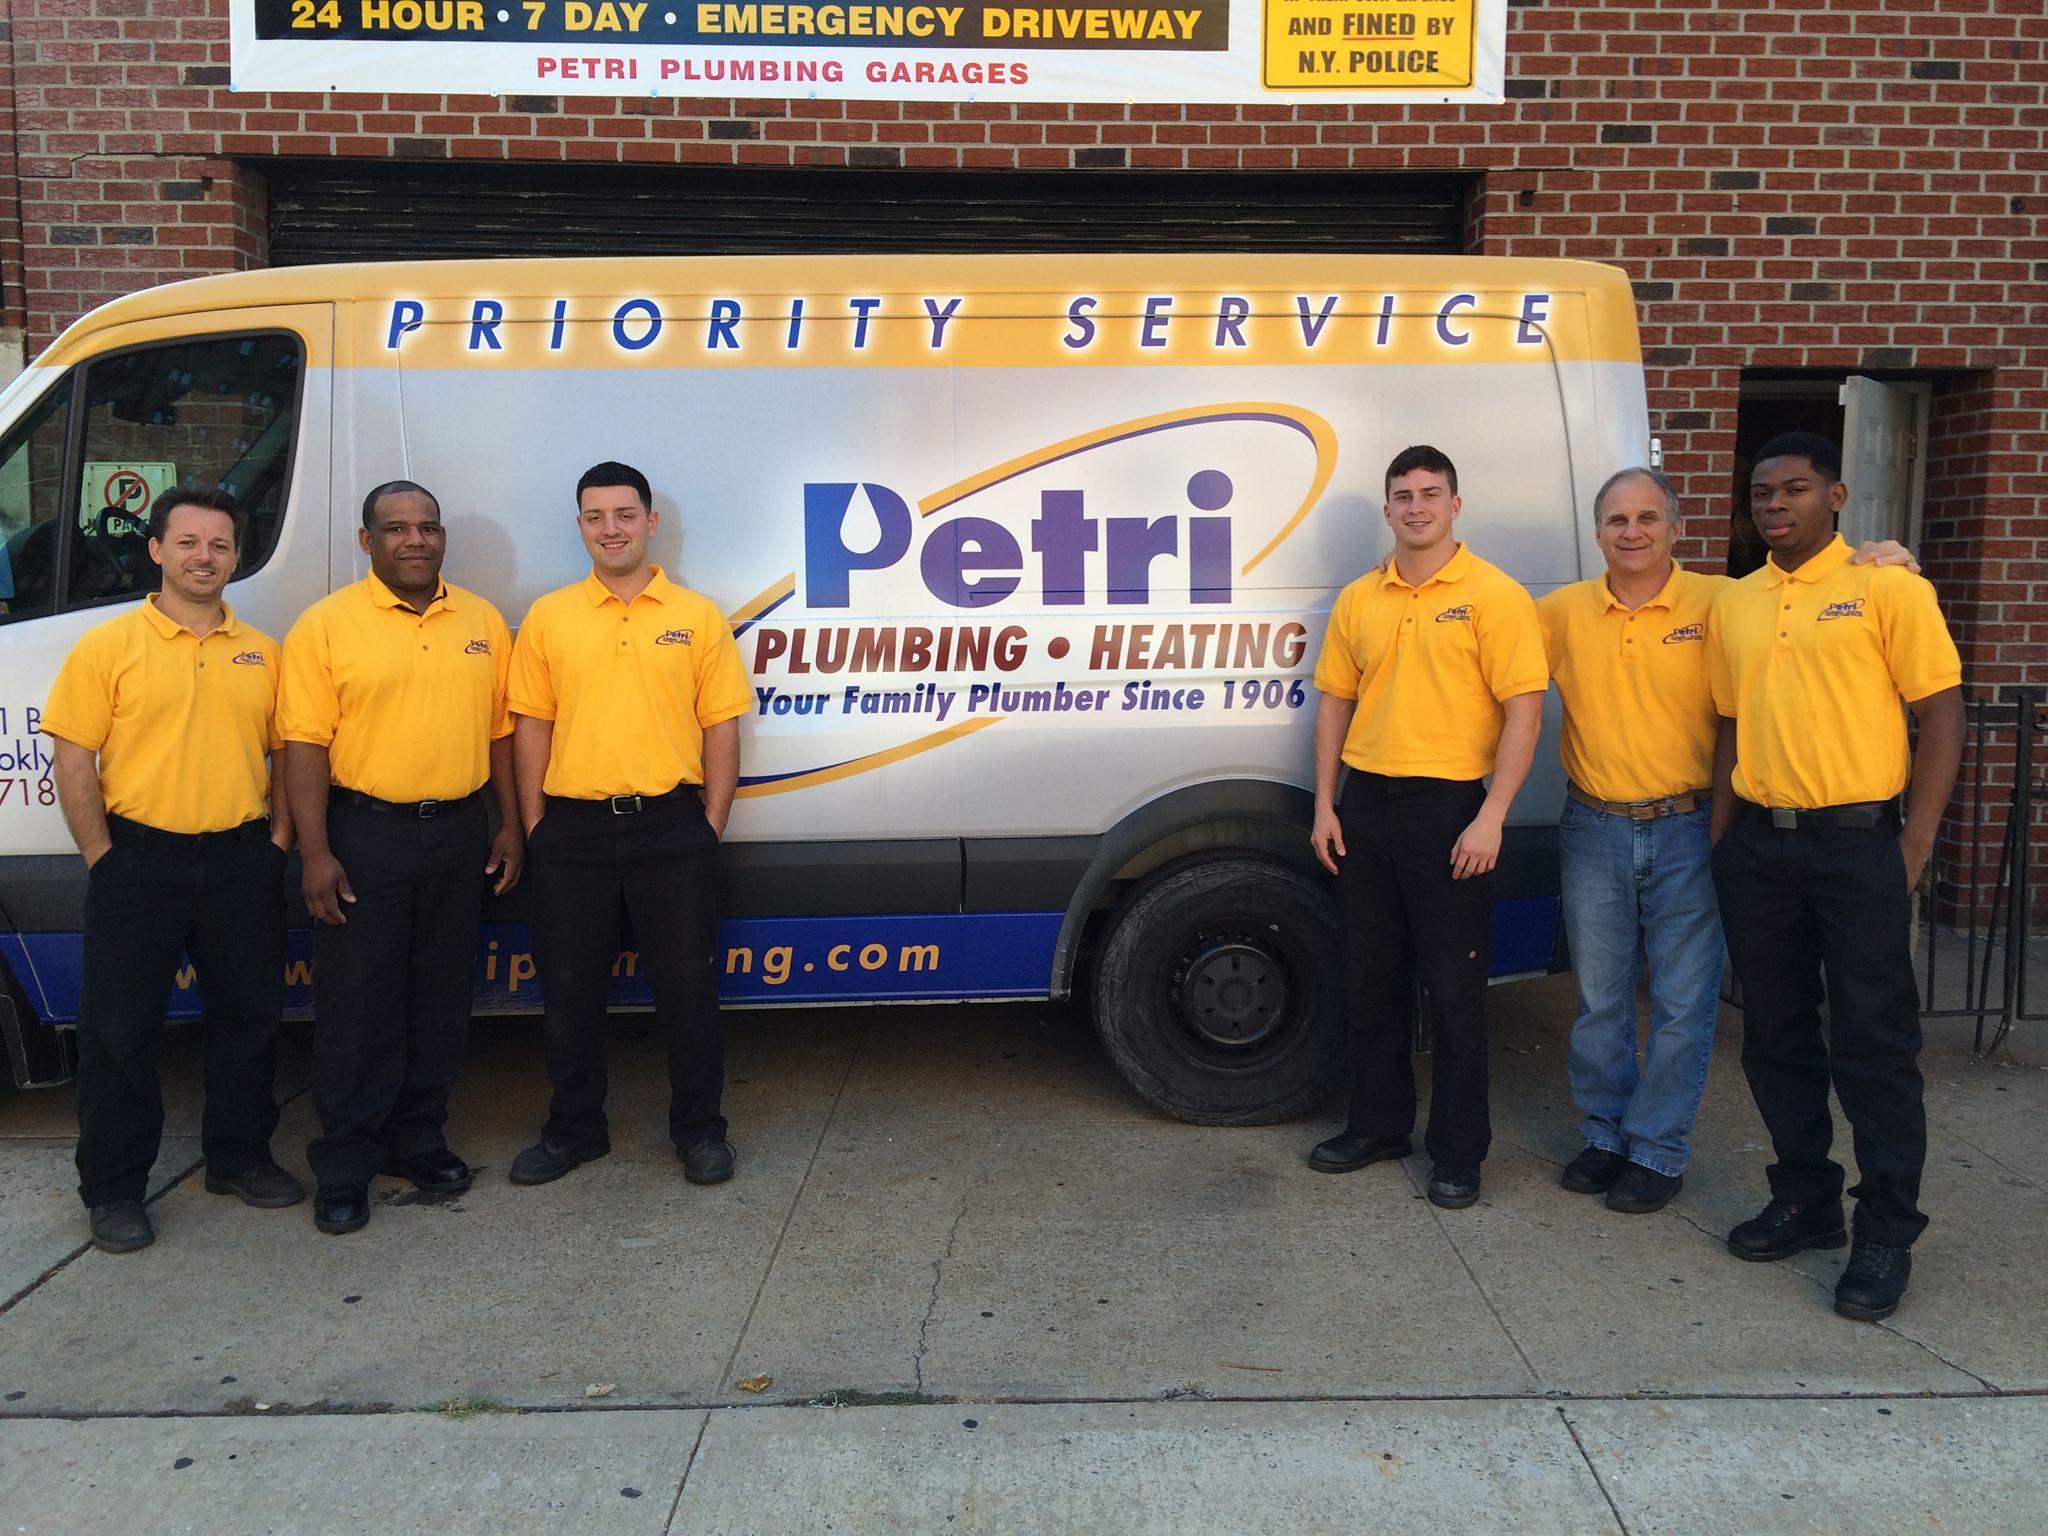 Petri Plumbing & Heating Phone Number